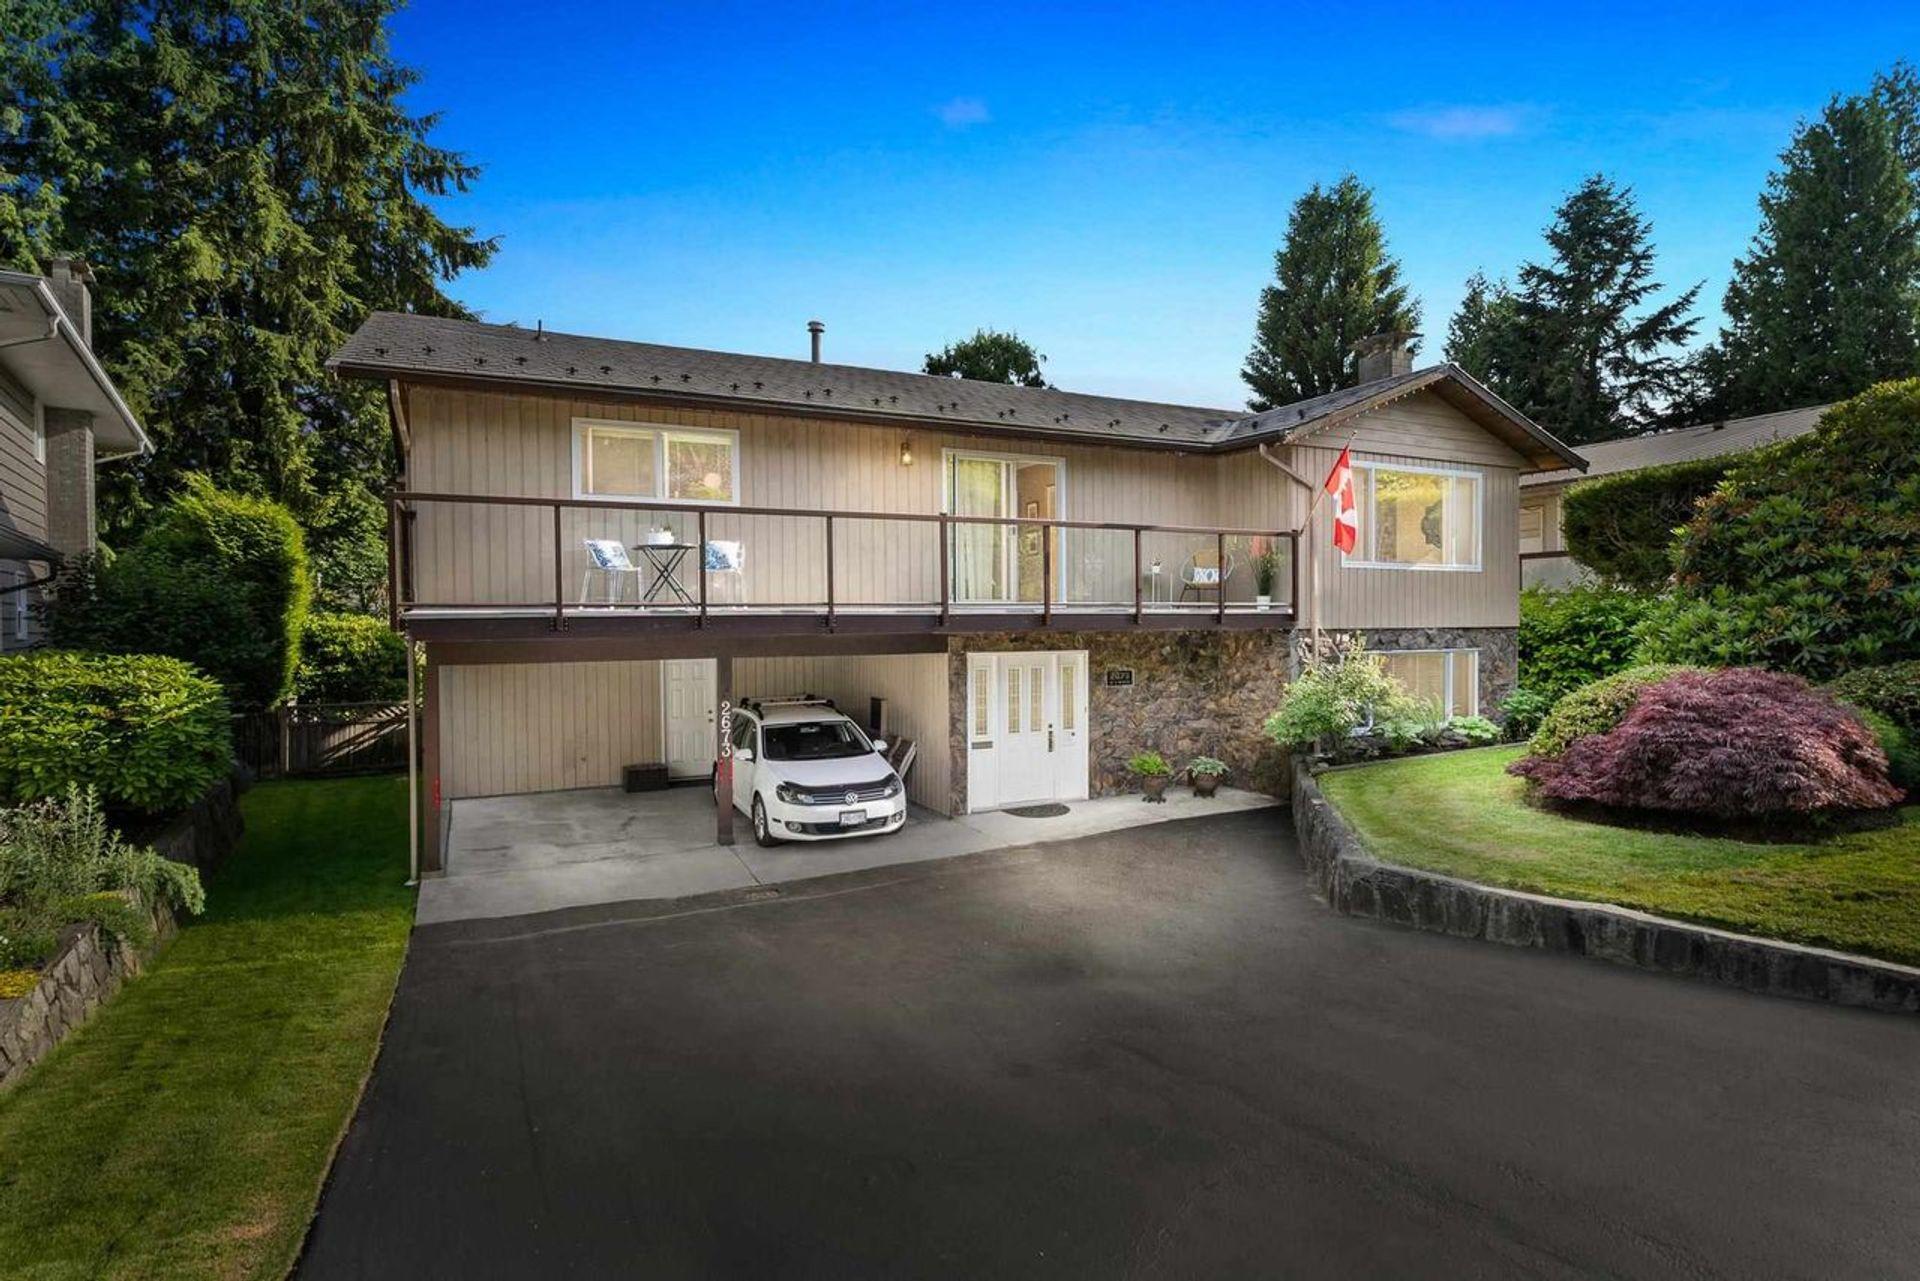 2673-byron-road-blueridge-nv-north-vancouver-02 at 2673 Byron Road, Blueridge NV, North Vancouver